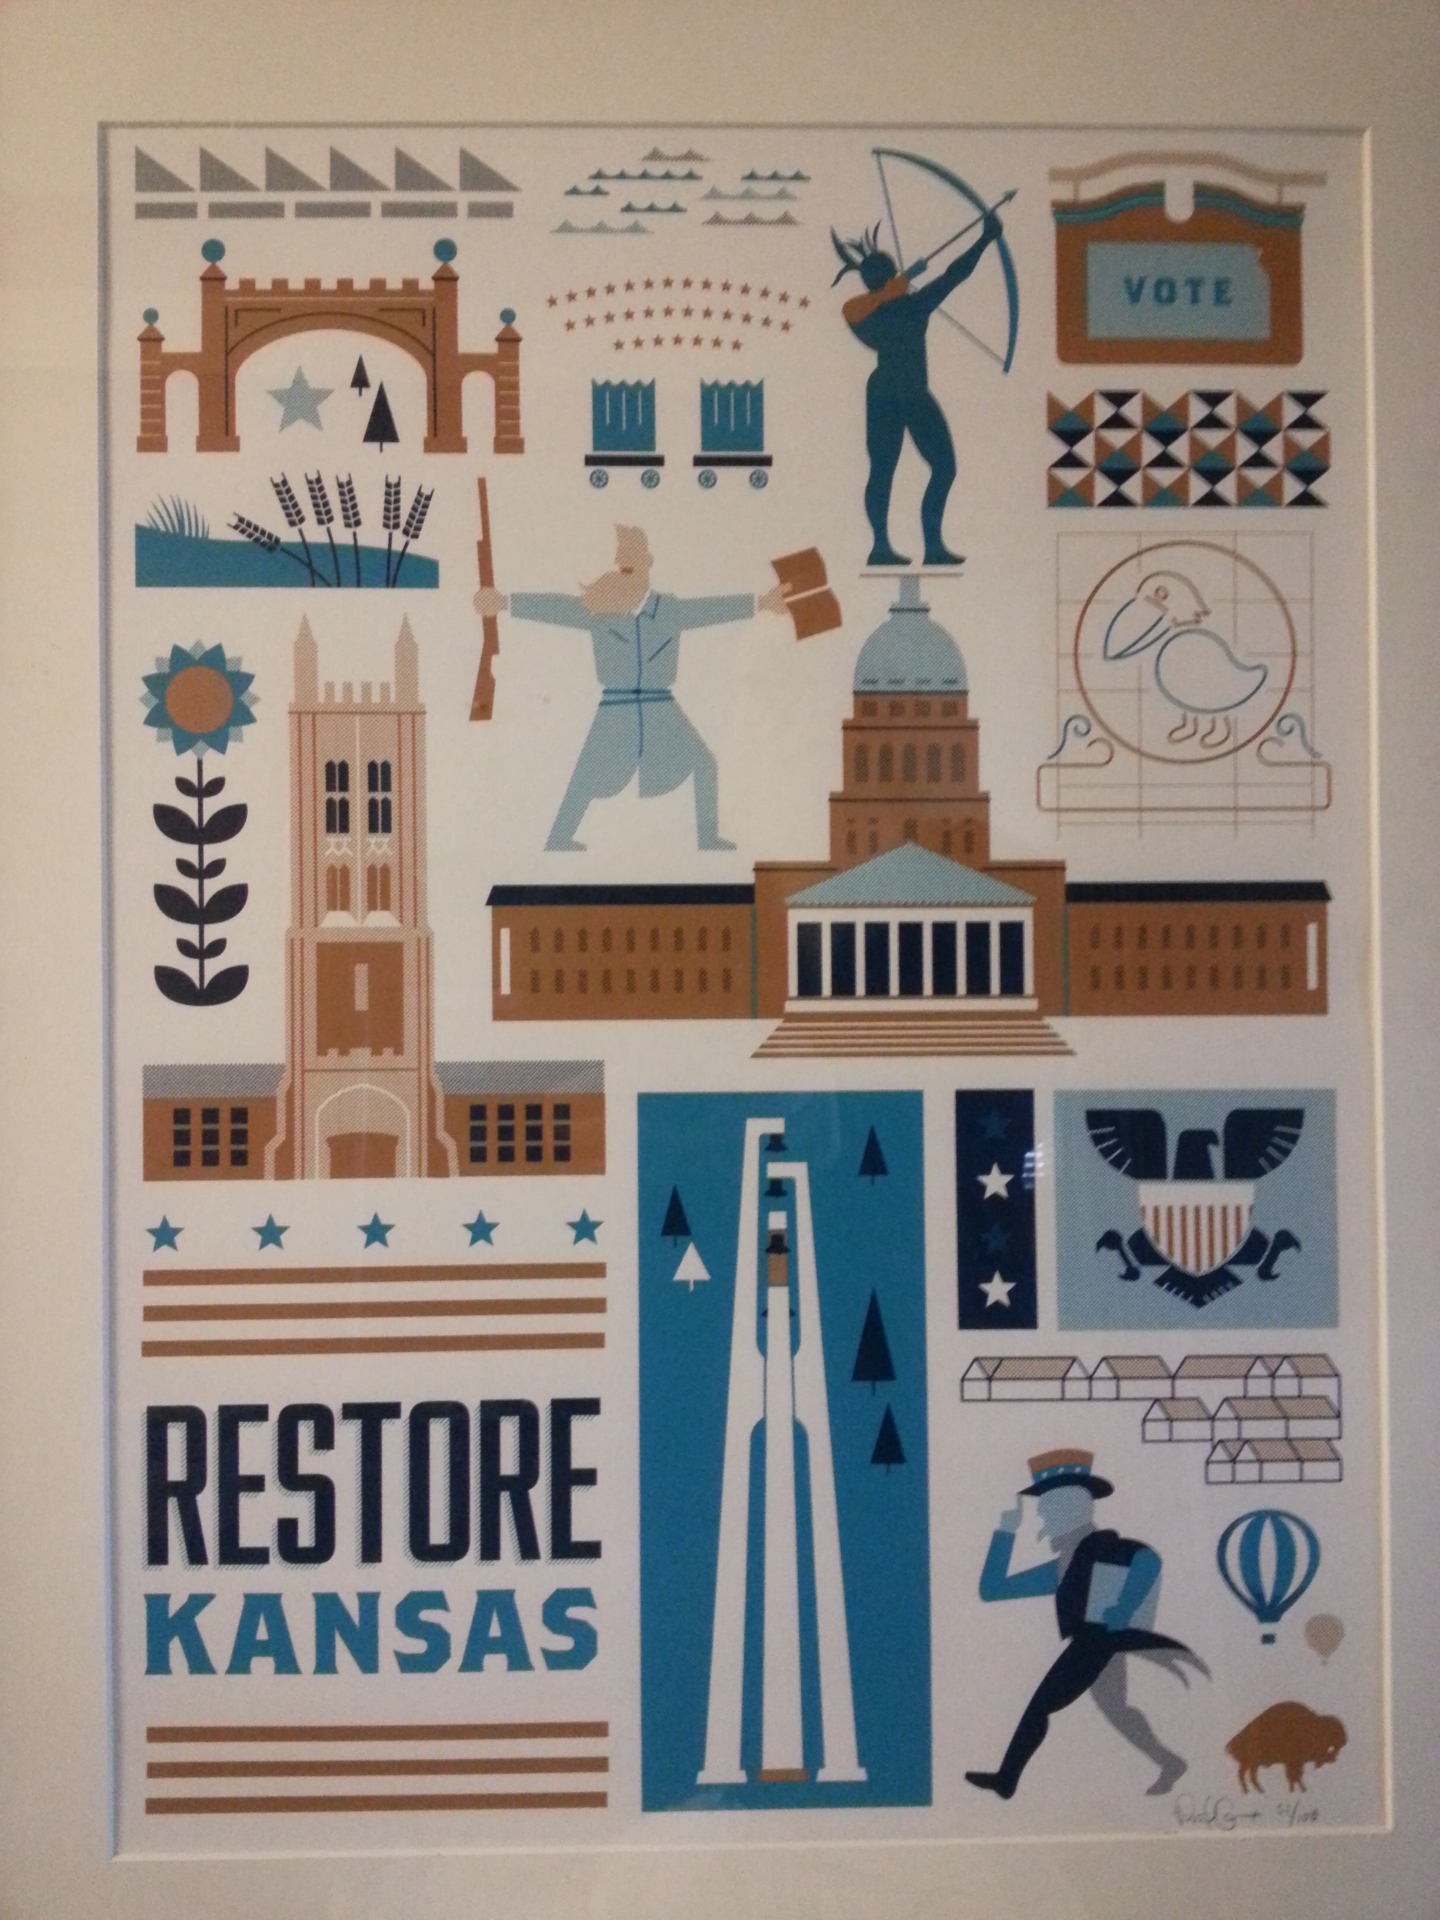 Restore Kansas